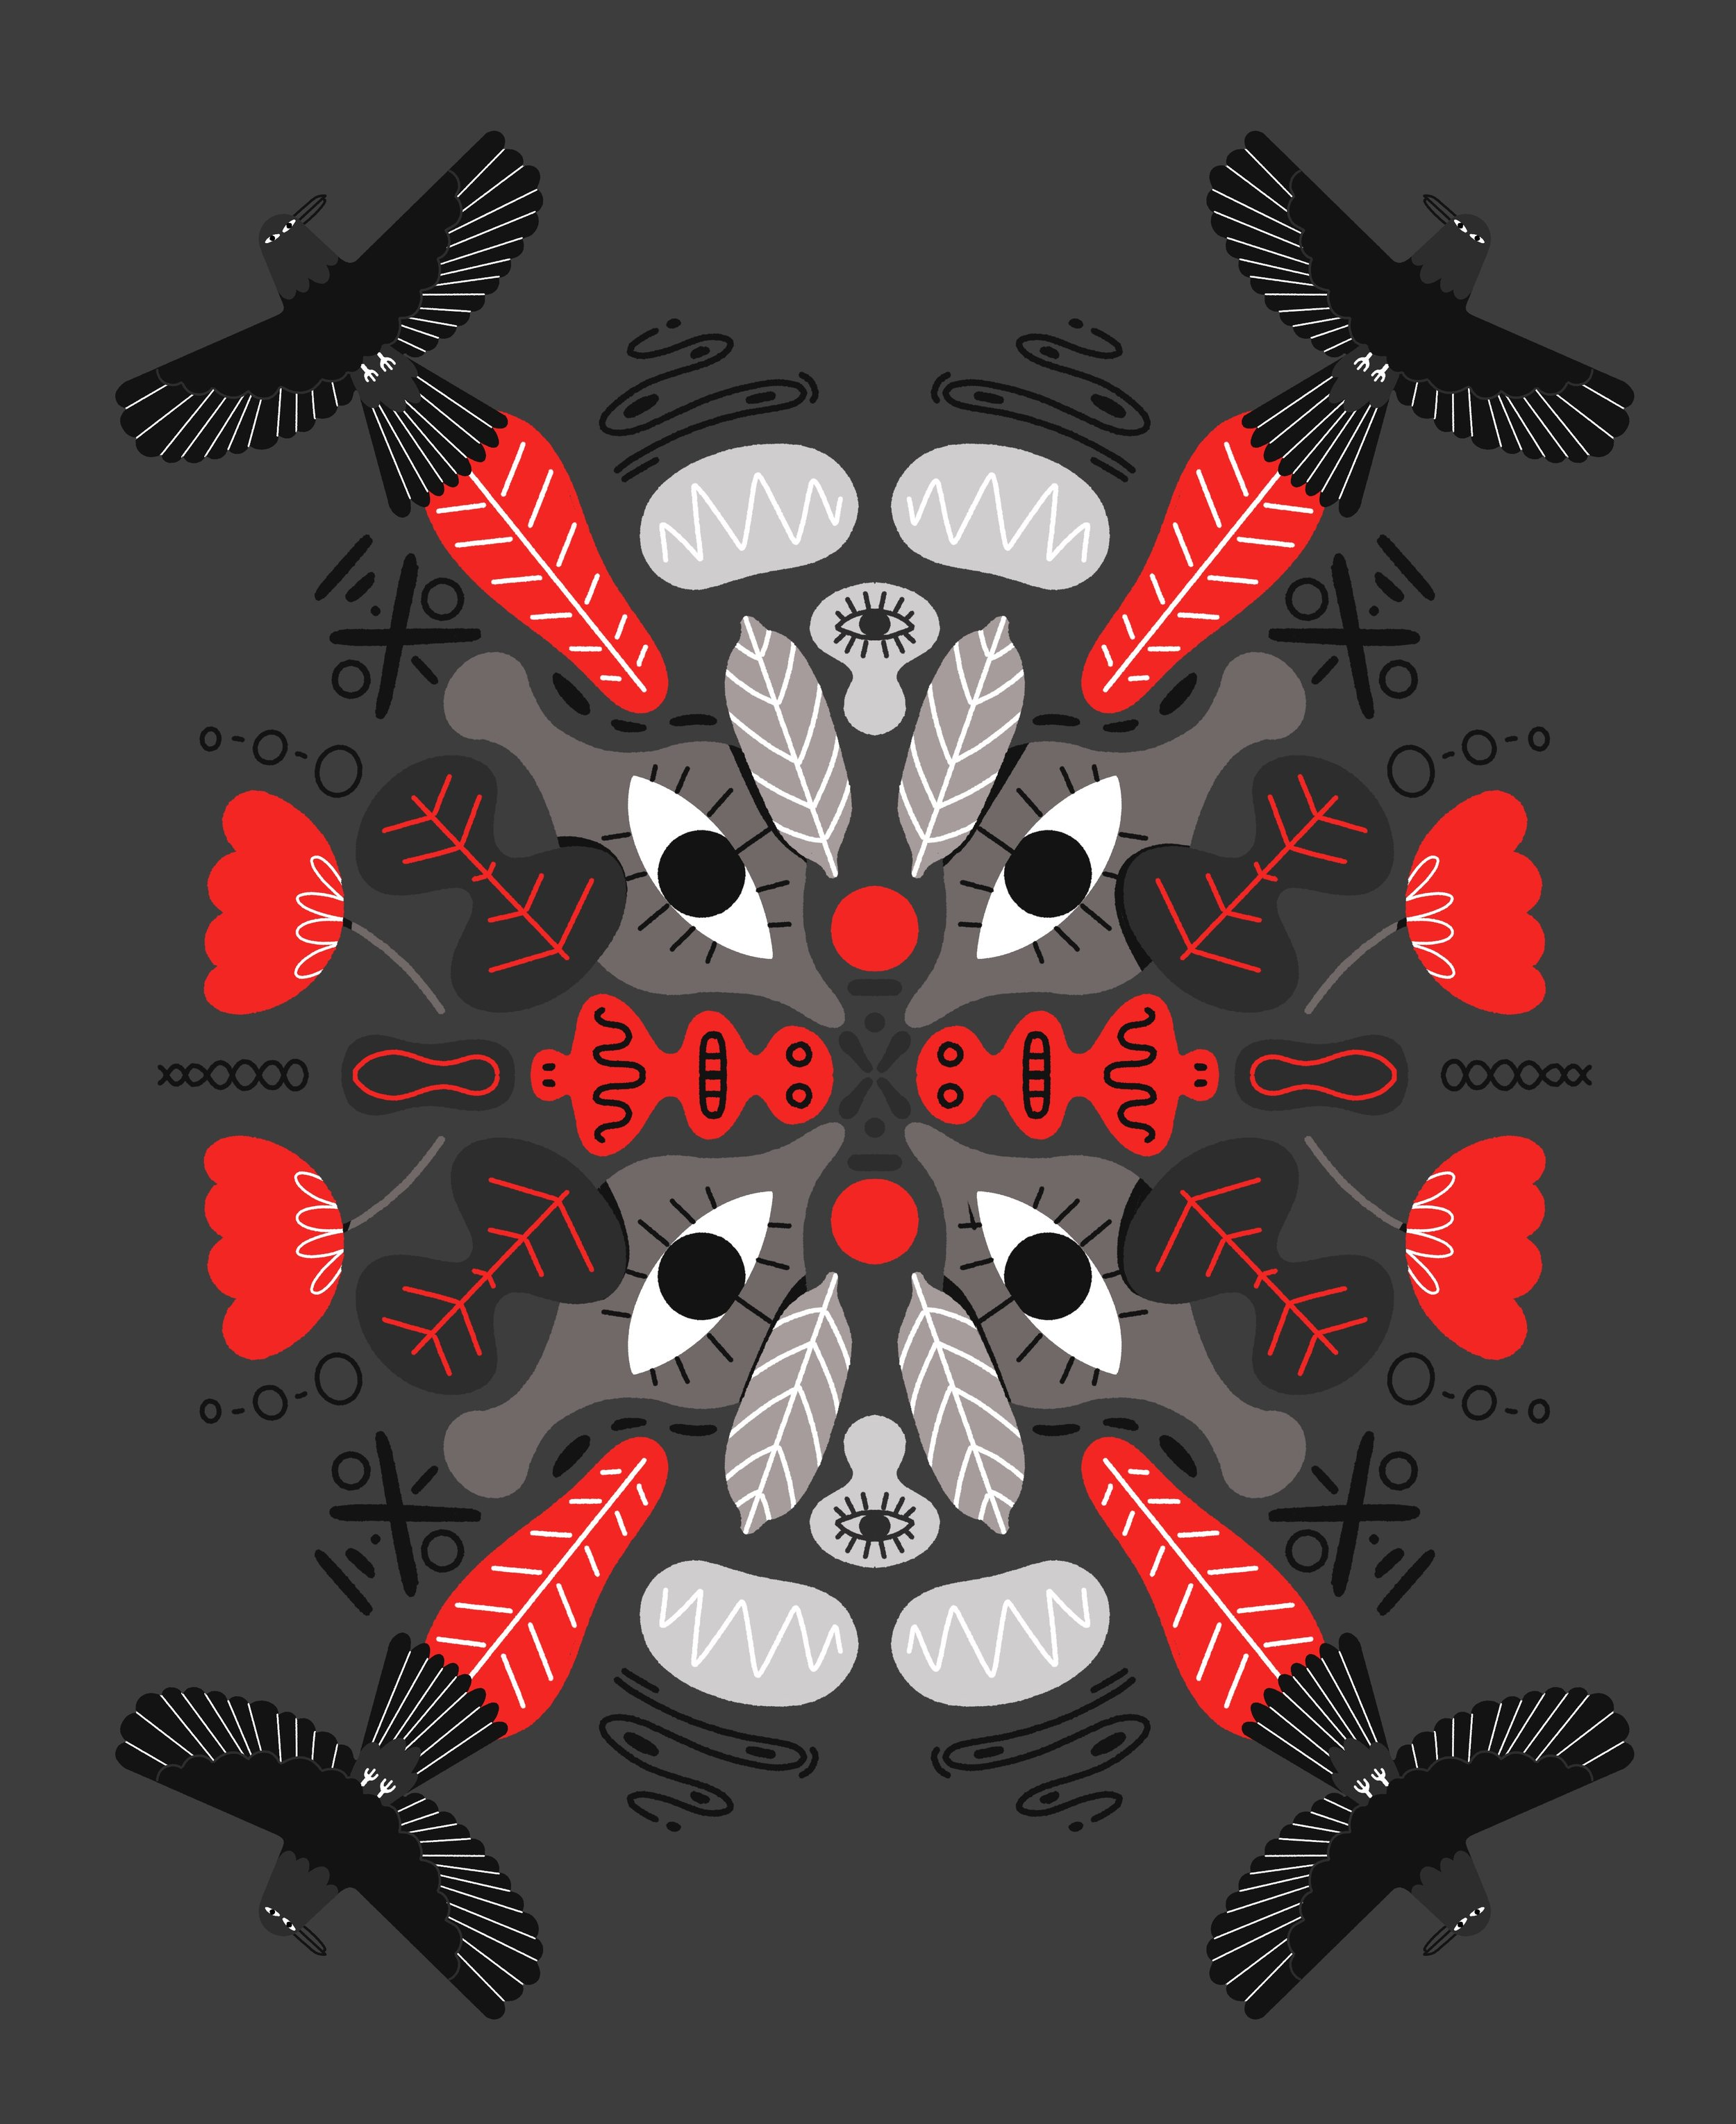 Symmetrical-design 1.jpg